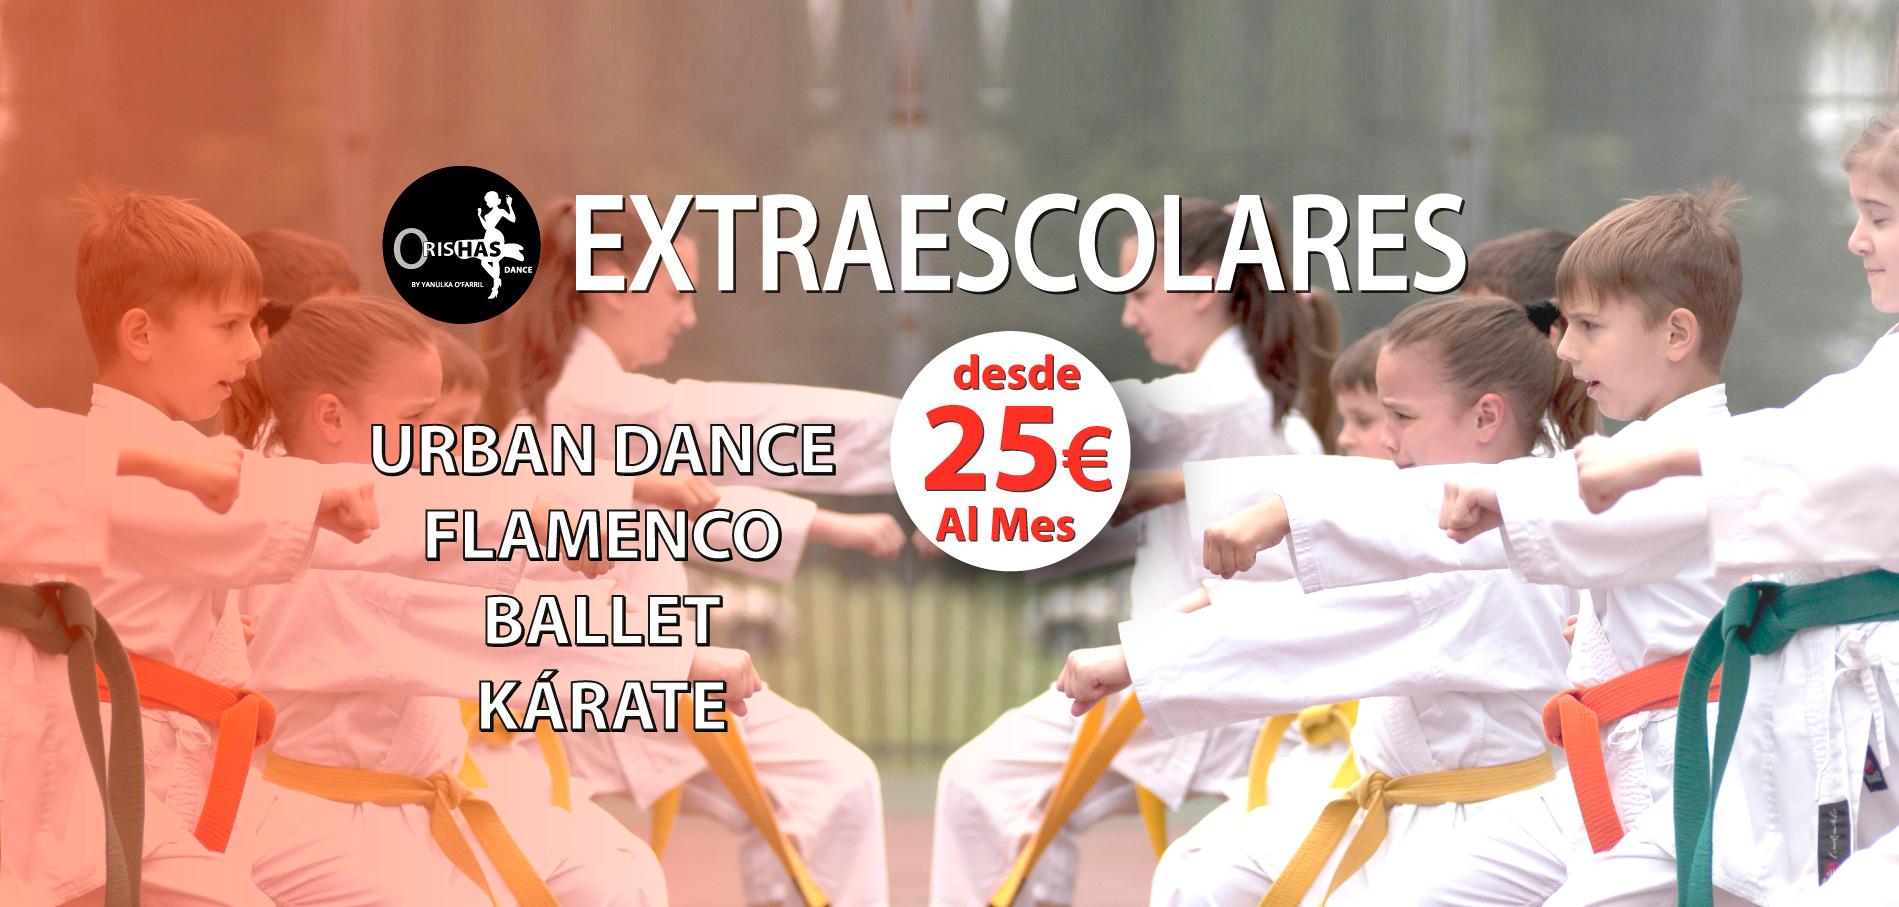 CARTELES-CALLE-150X100-EXTRAESCOLARES-WEB